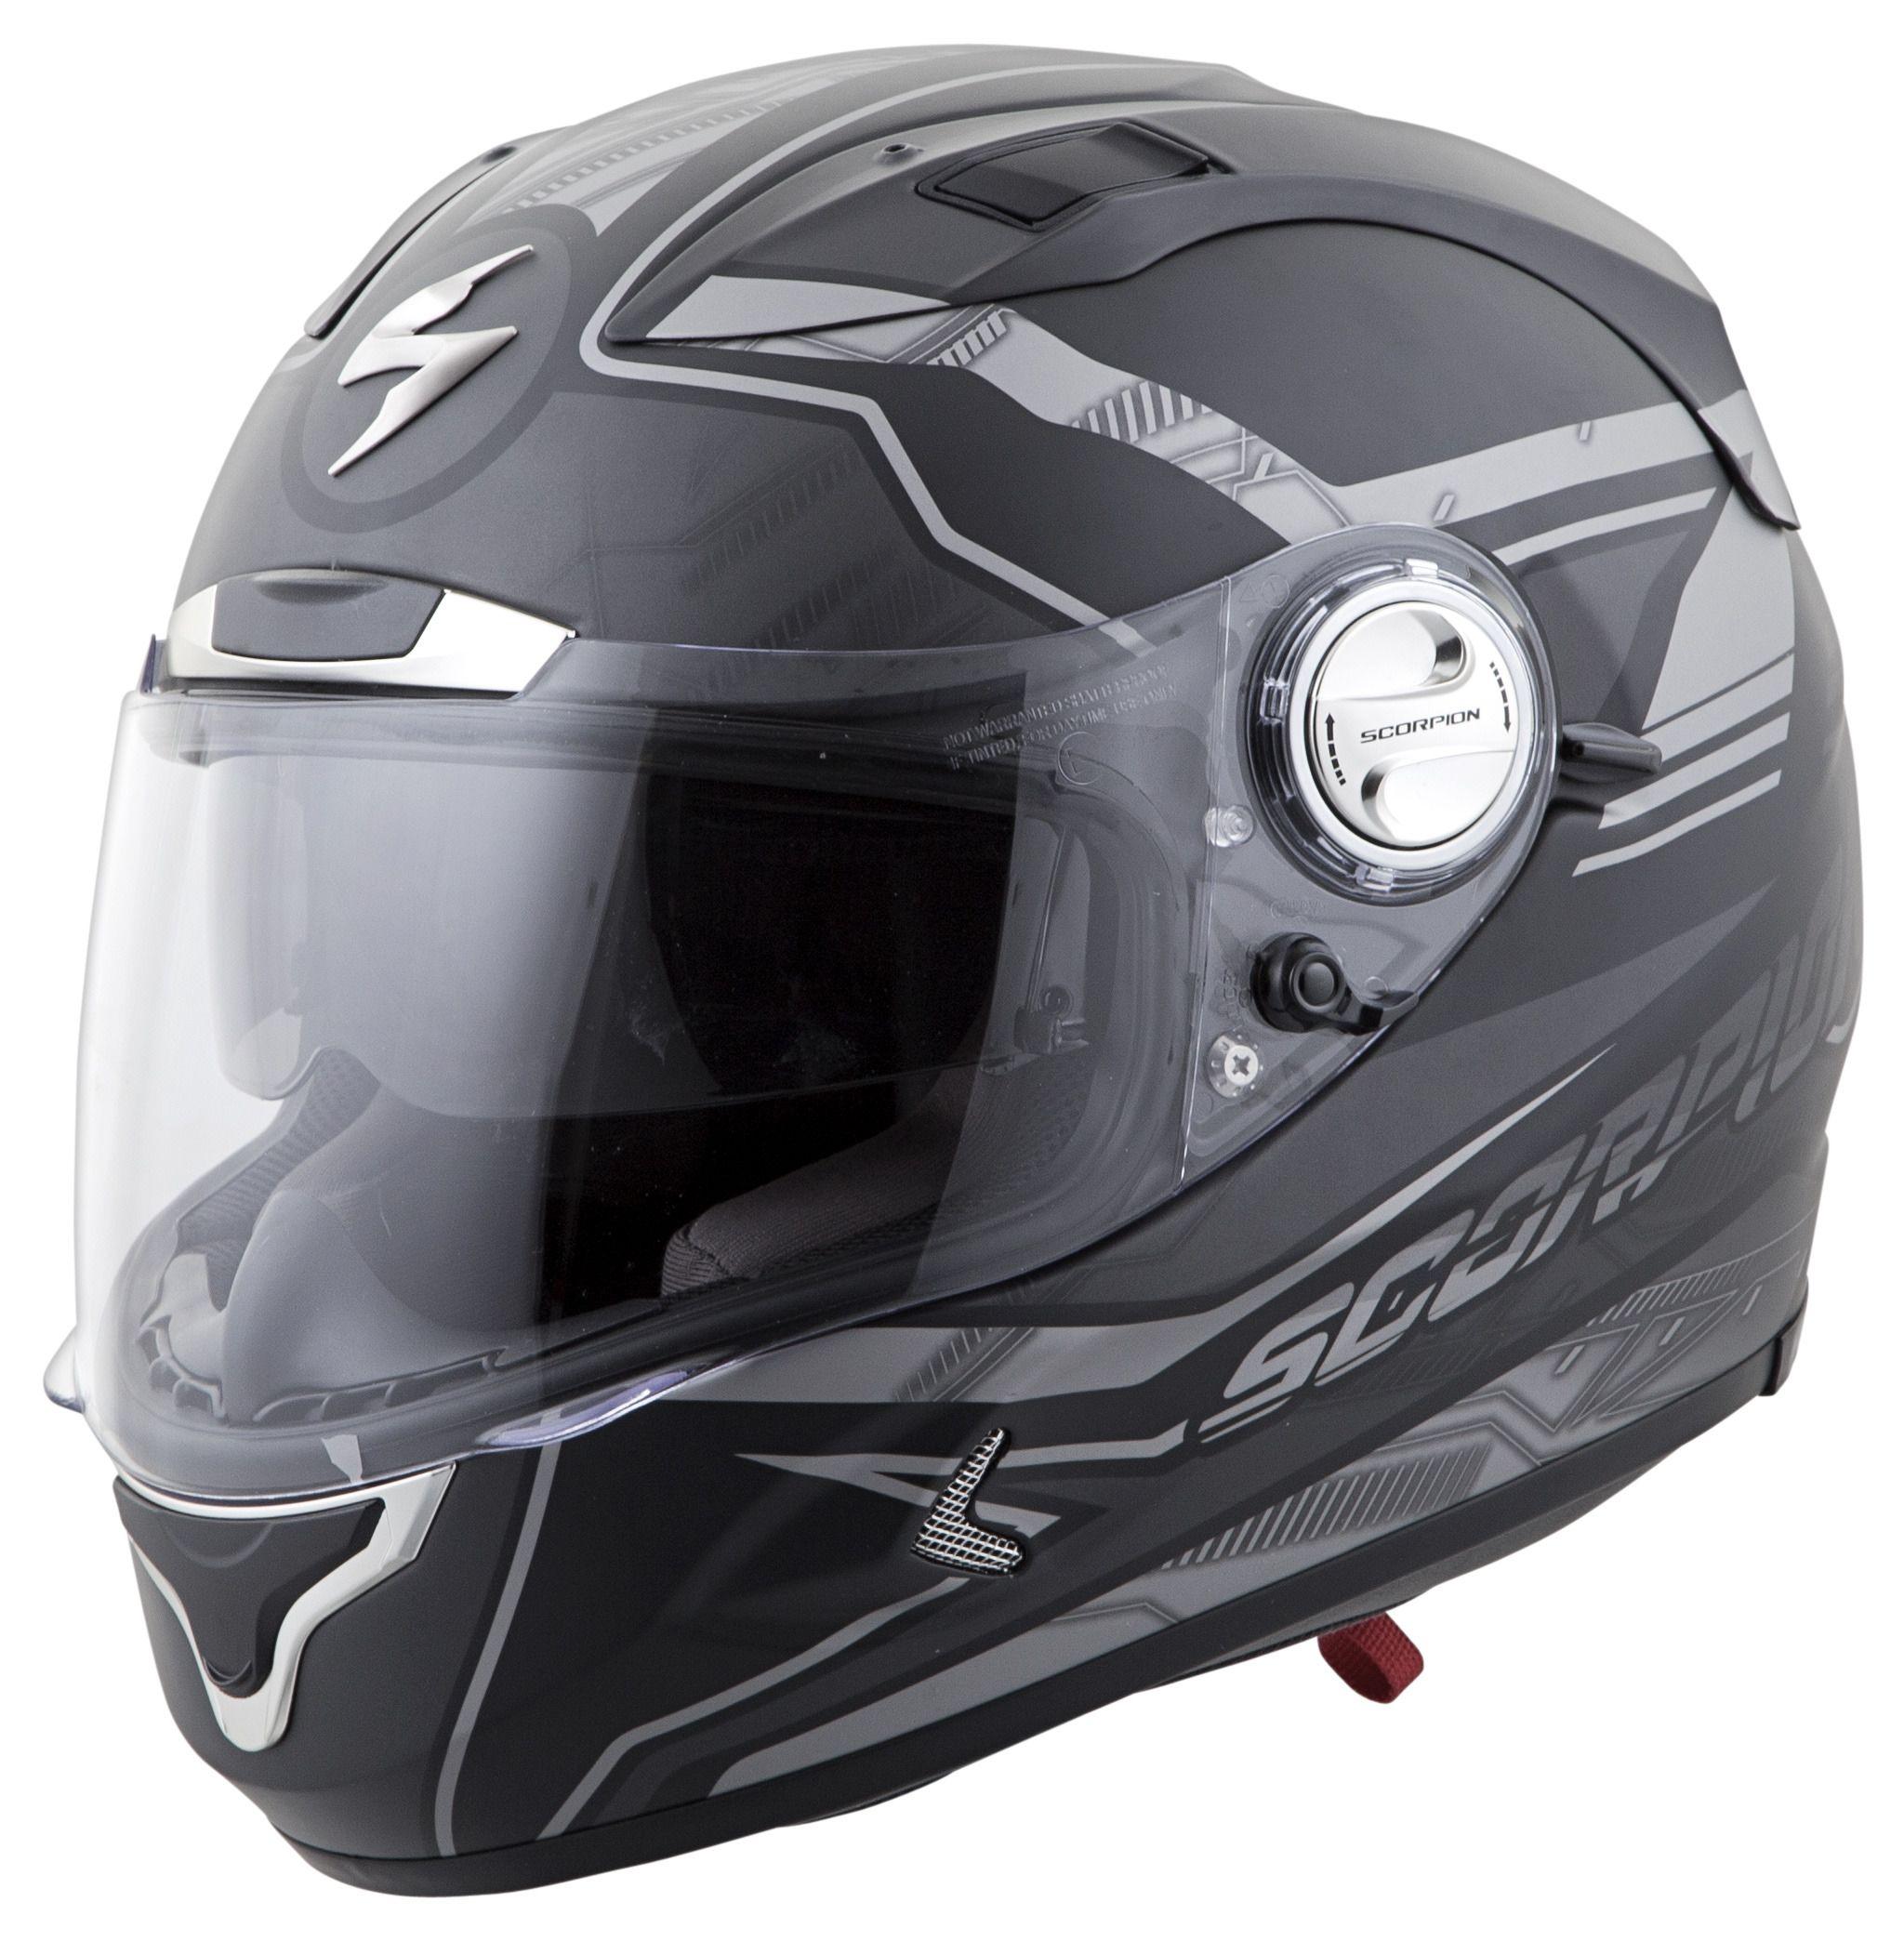 scorpion exo 1100 jag helmet revzilla. Black Bedroom Furniture Sets. Home Design Ideas